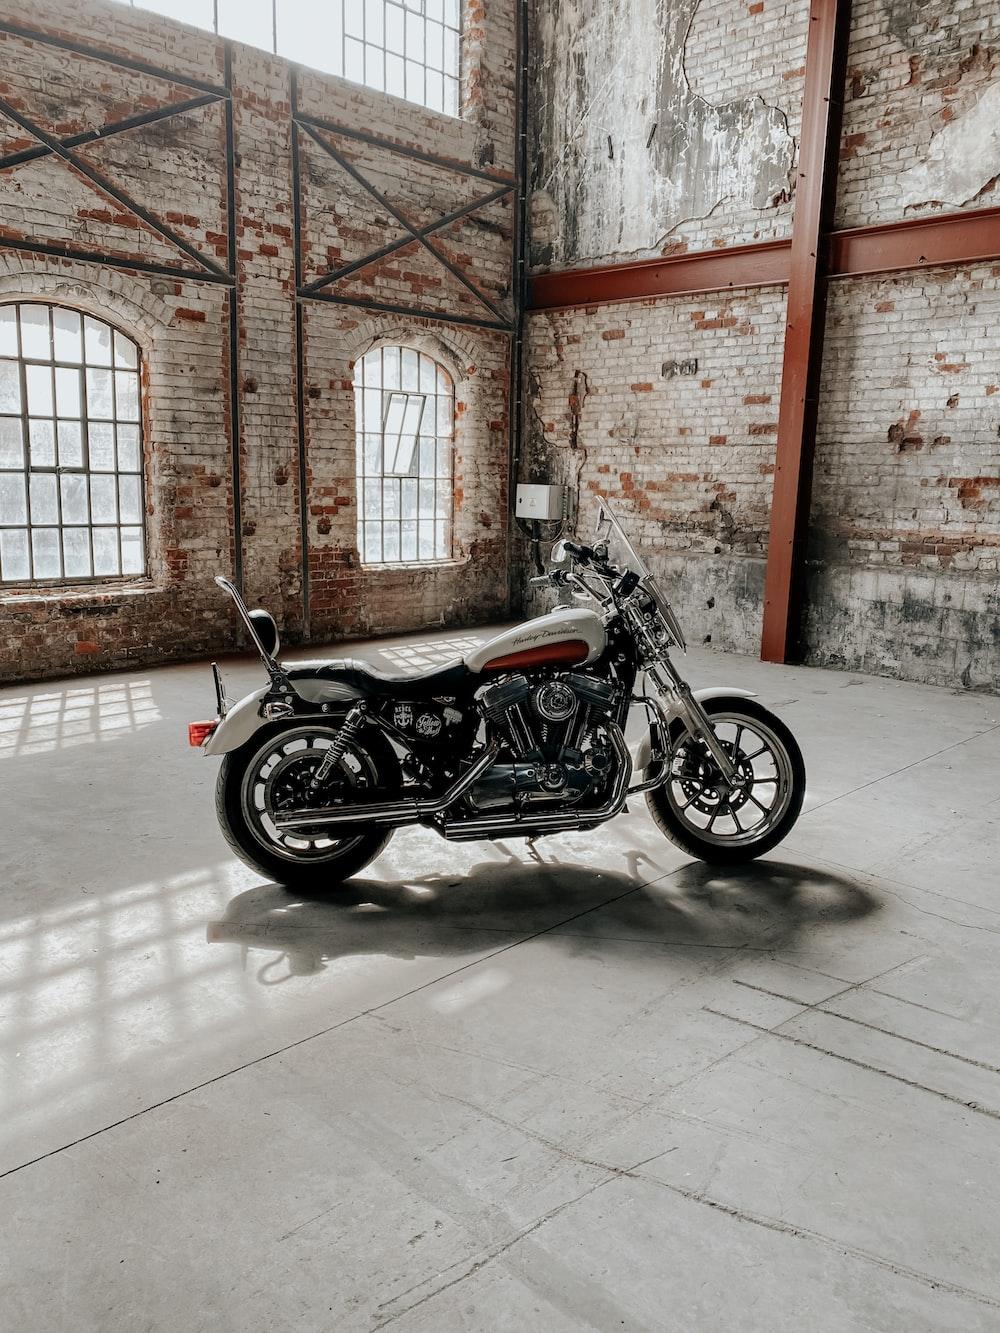 black cruiser motorcycle parked beside brown brick wall